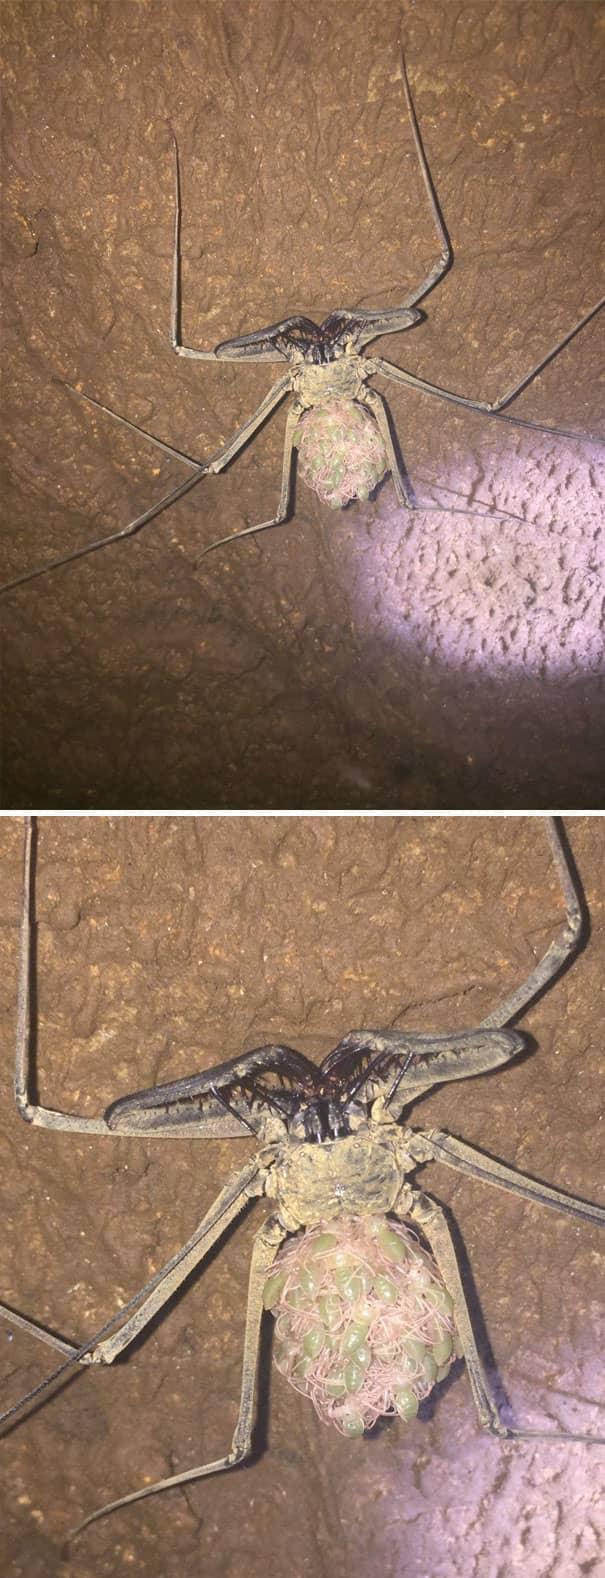 Самка жгутоногих пауков носит потомство на спине